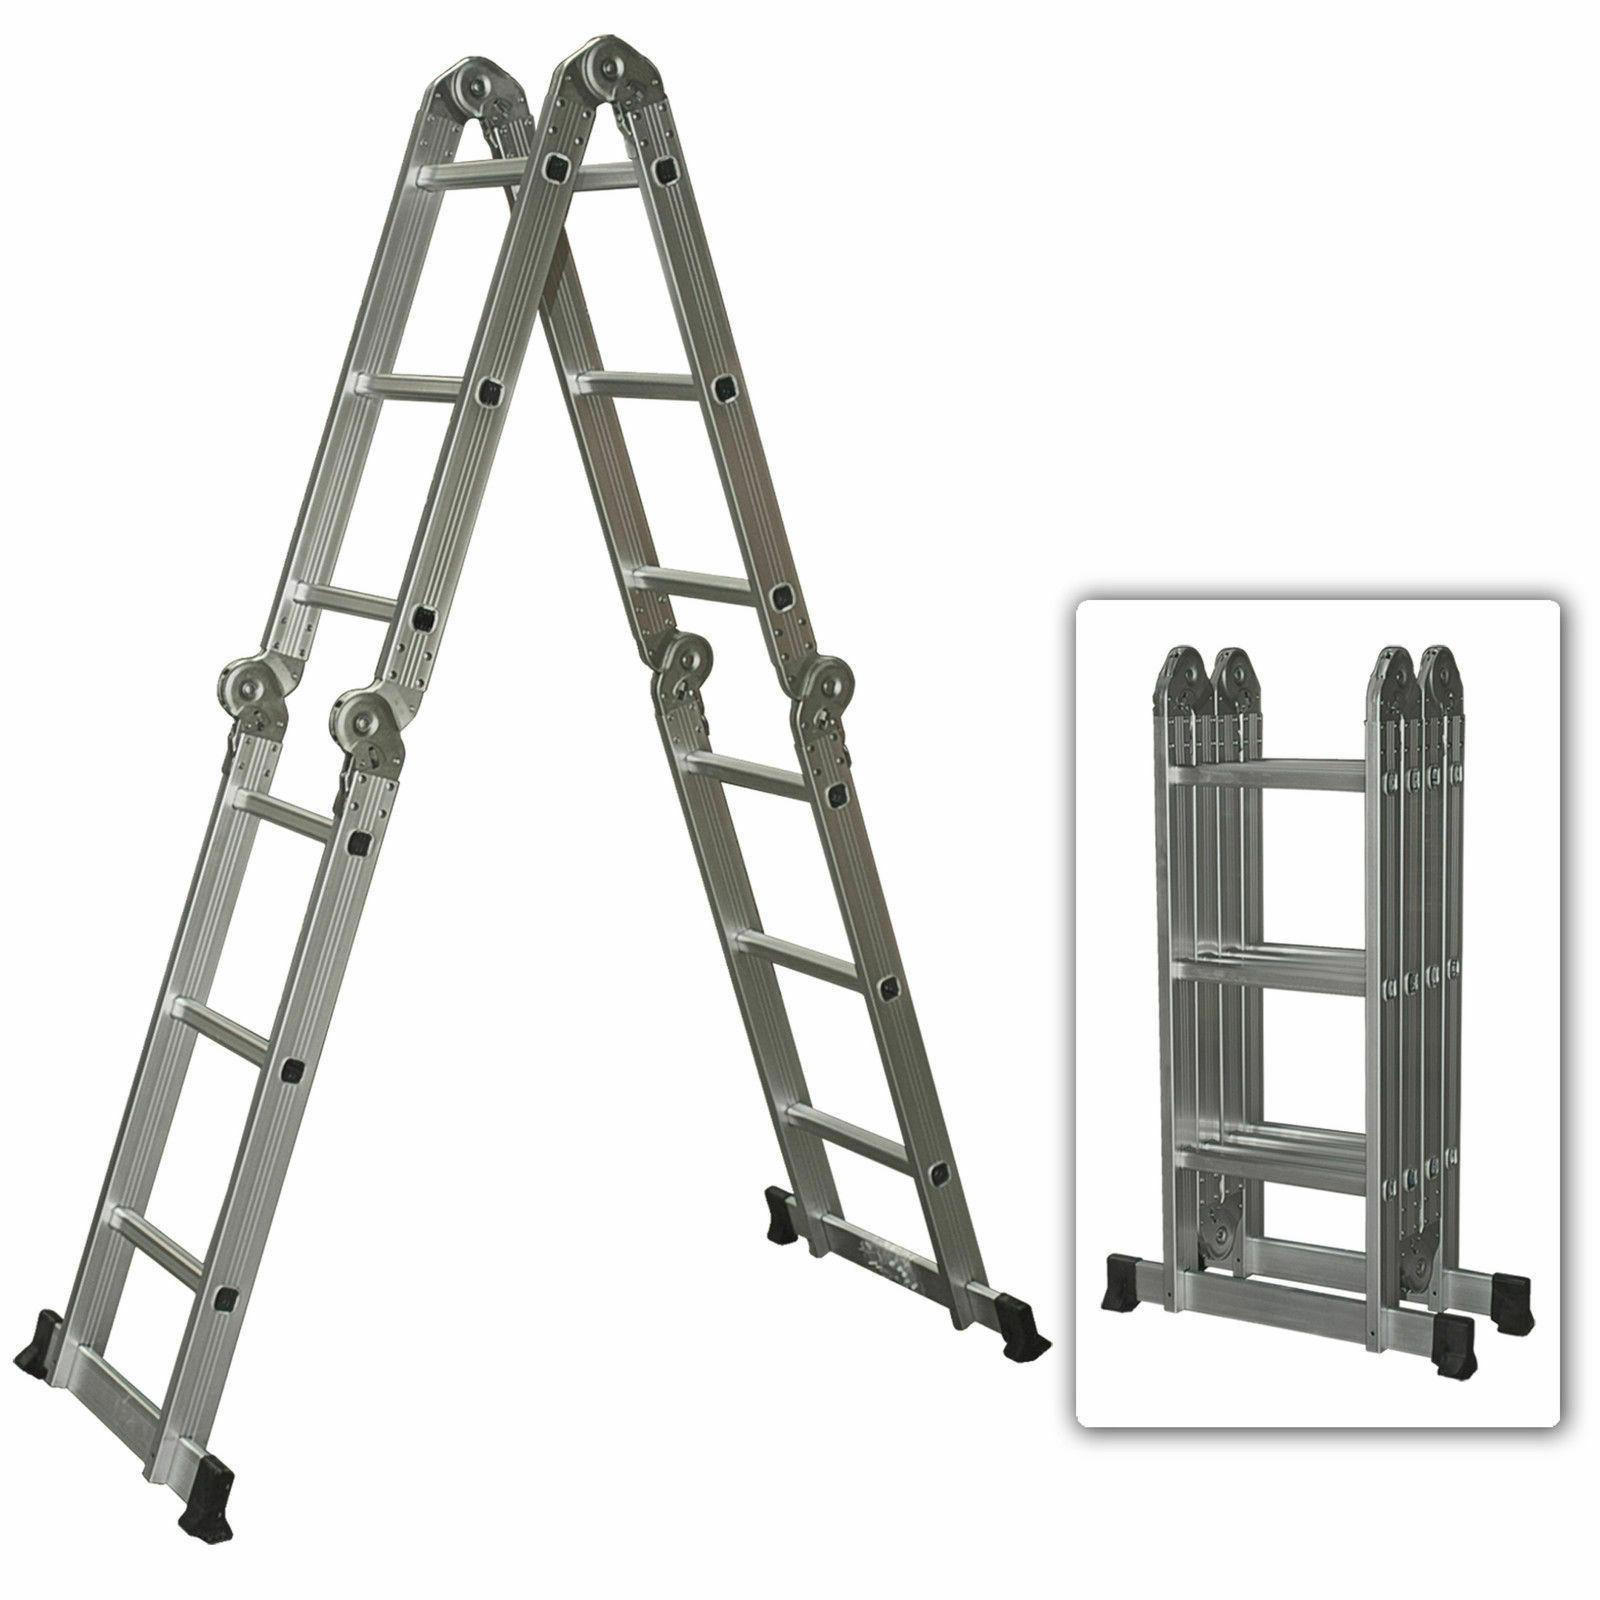 Aluminum Ladder Ladder Extendable Heavy Duty Multi Purpose